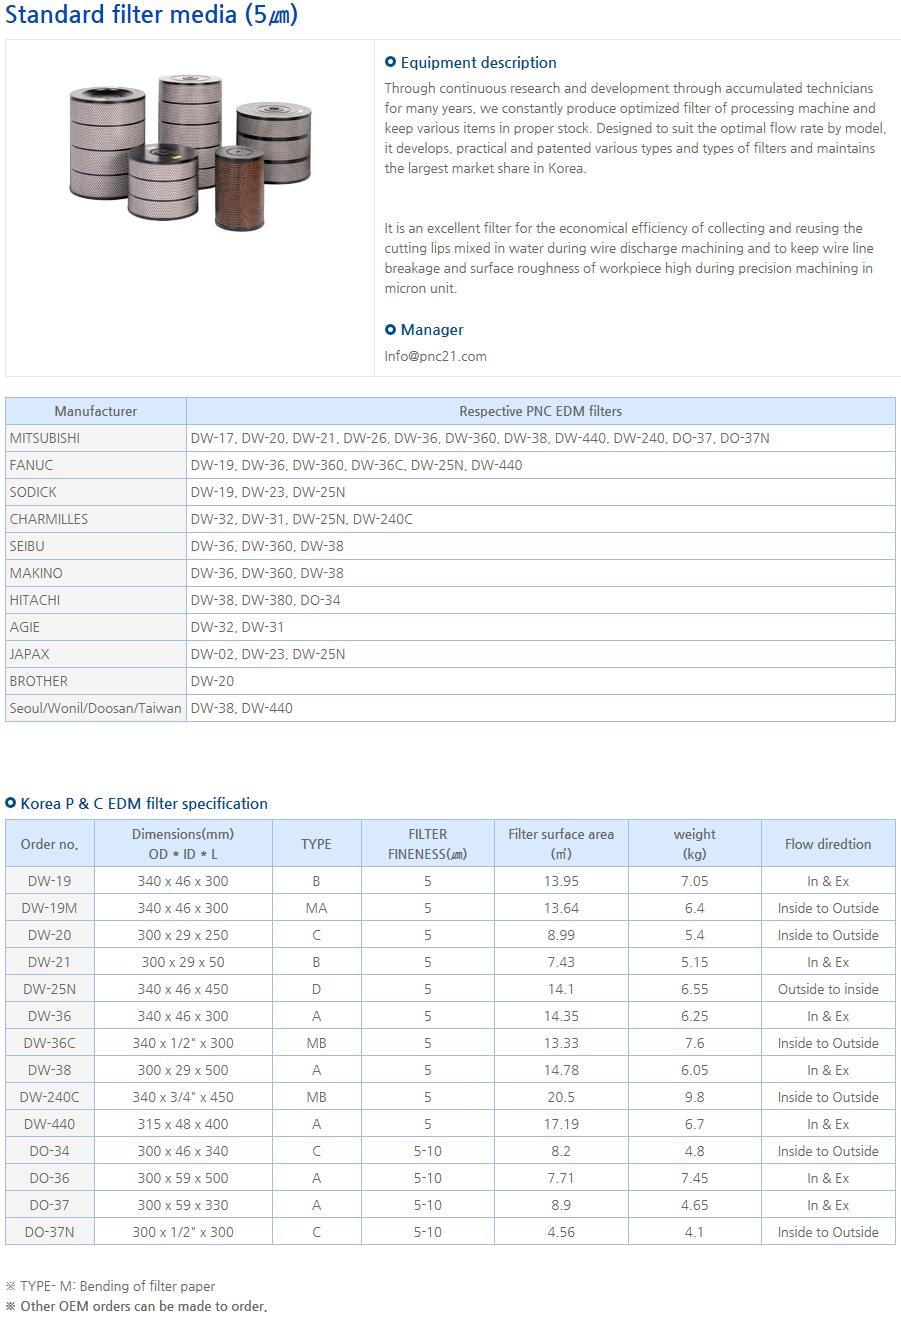 PNC EDM filters